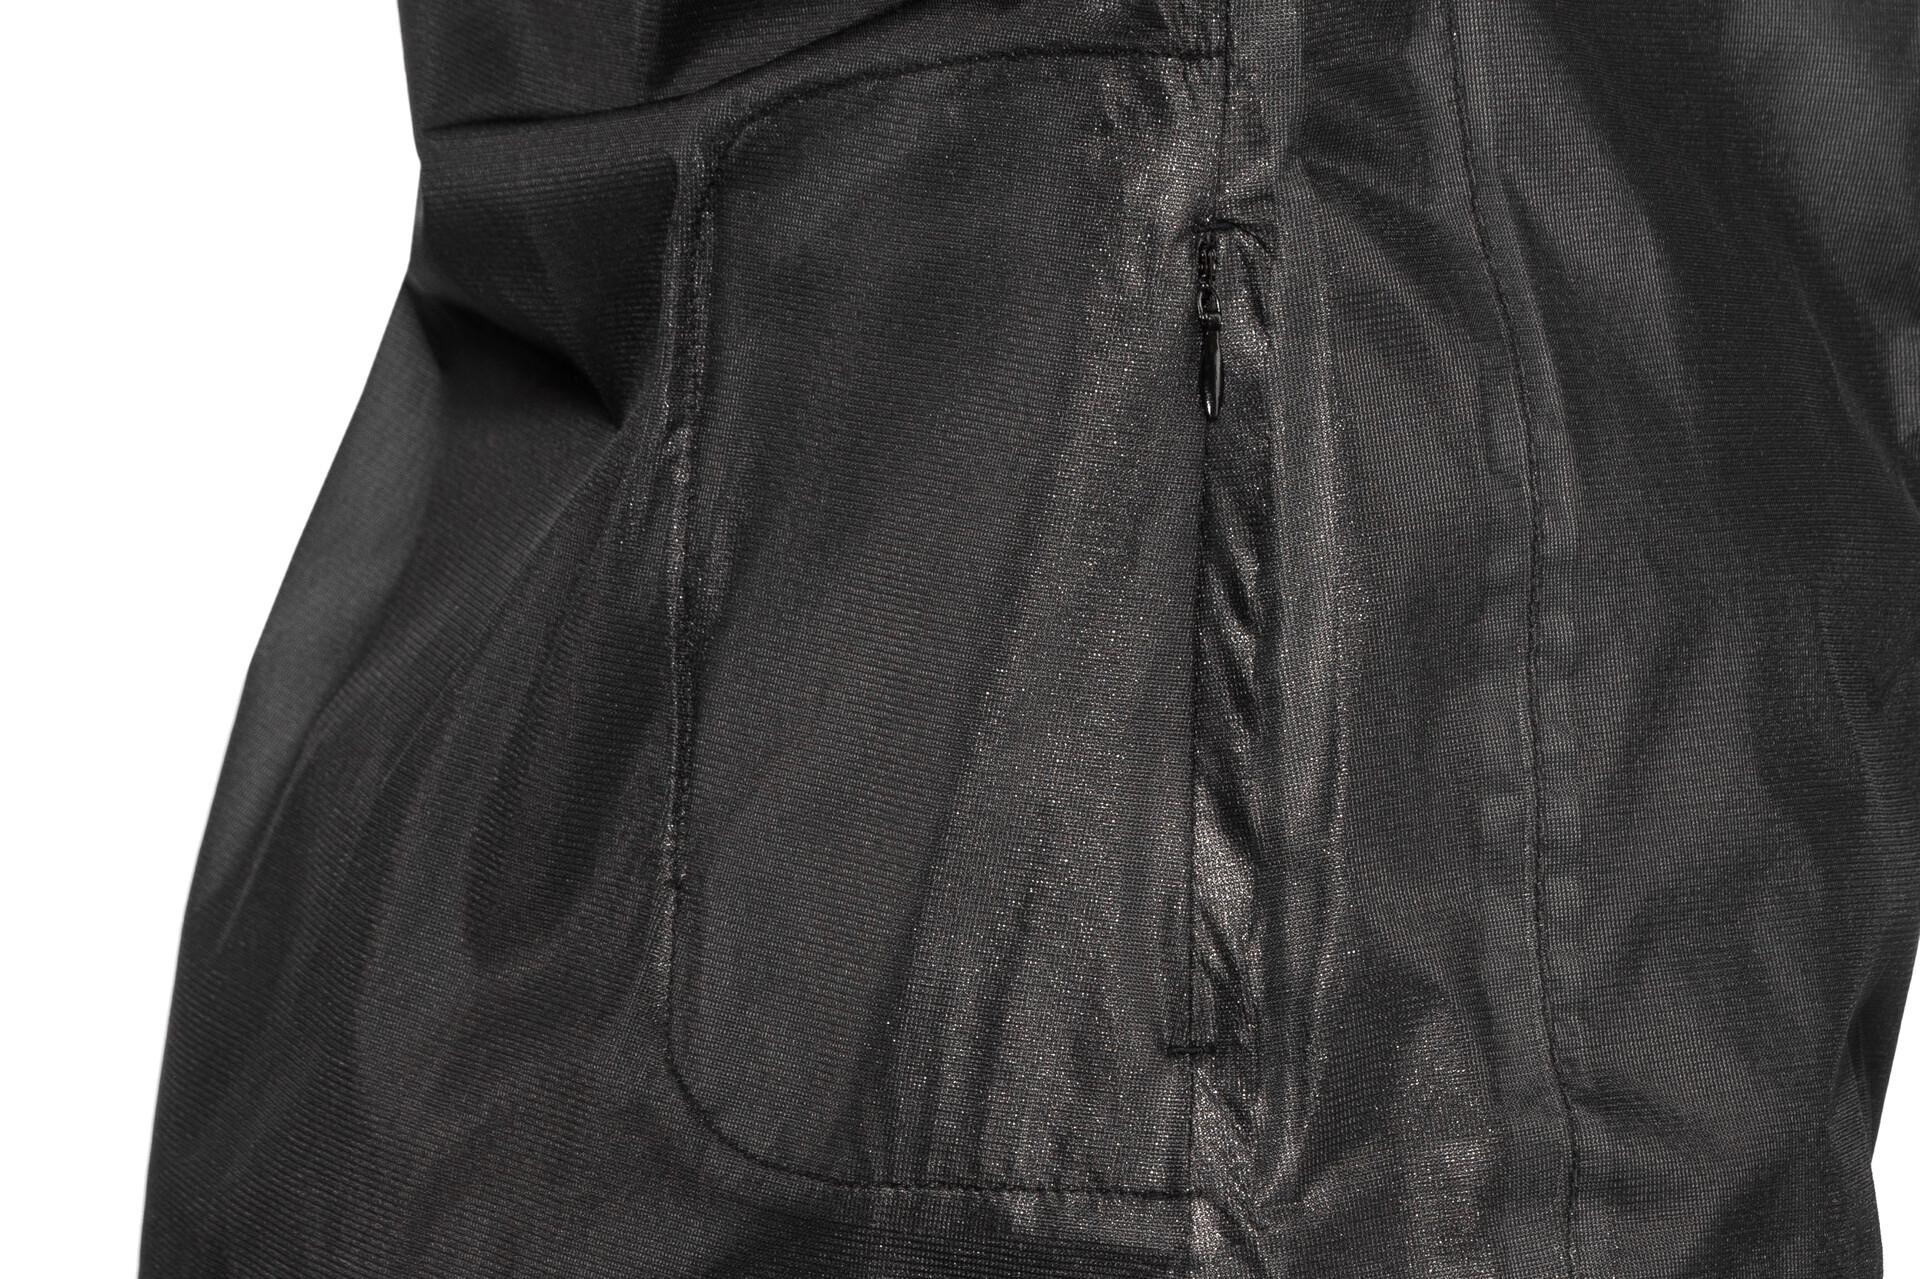 2xu FemmeBlackblack Veste 2xu FemmeBlackblack Veste 2xu Packable Packable vmNO08nw